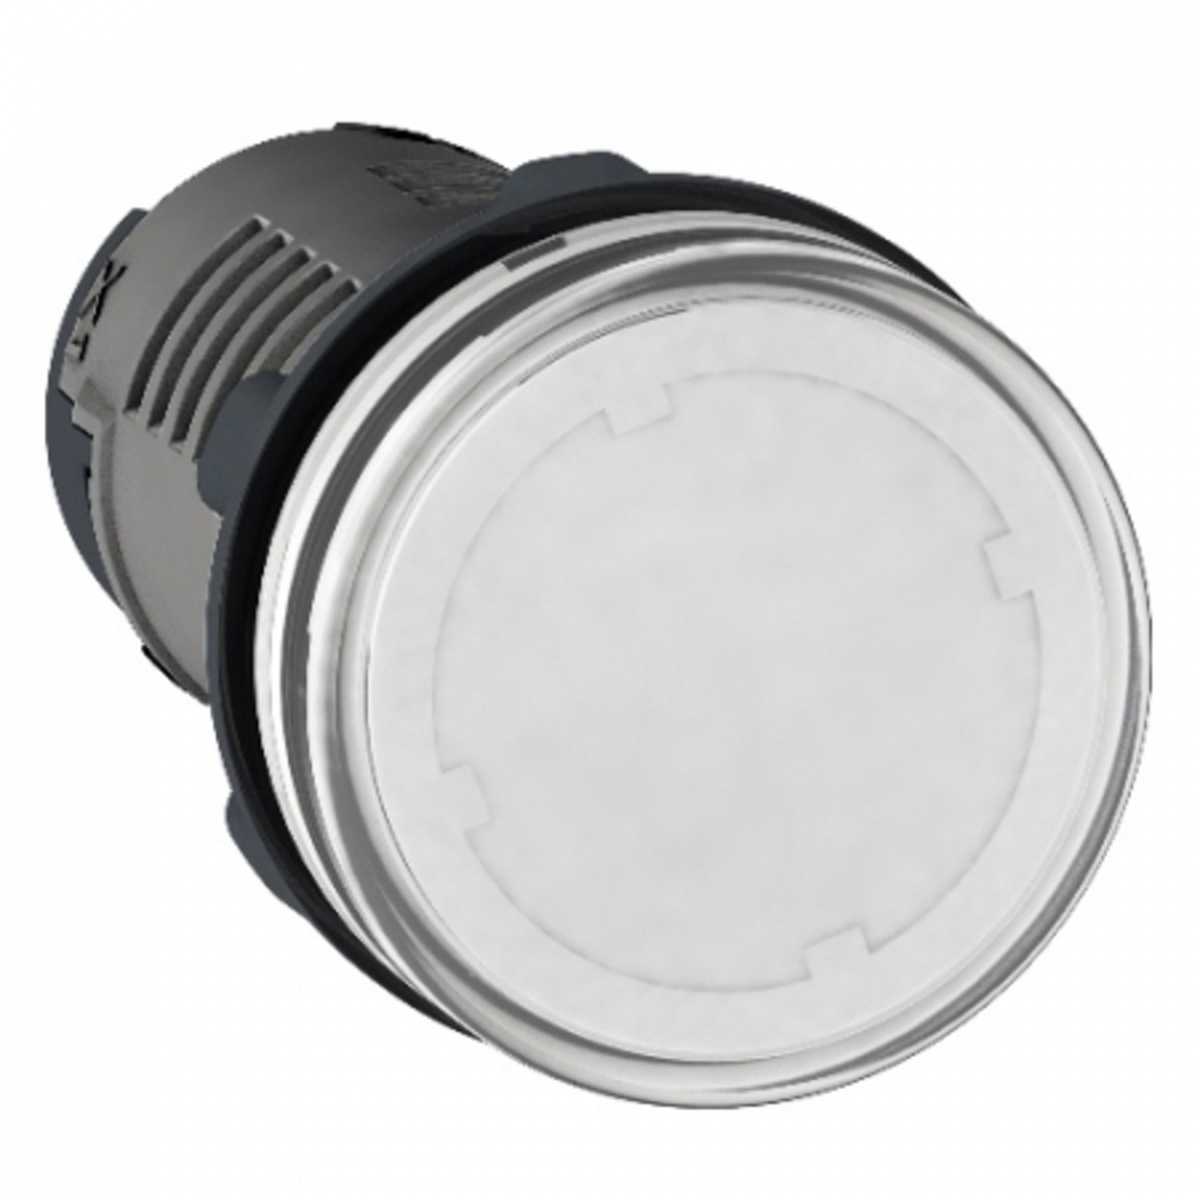 SINALIZADOR LED 22MM BC 24V XA2EVB1LC SCHNEIDER